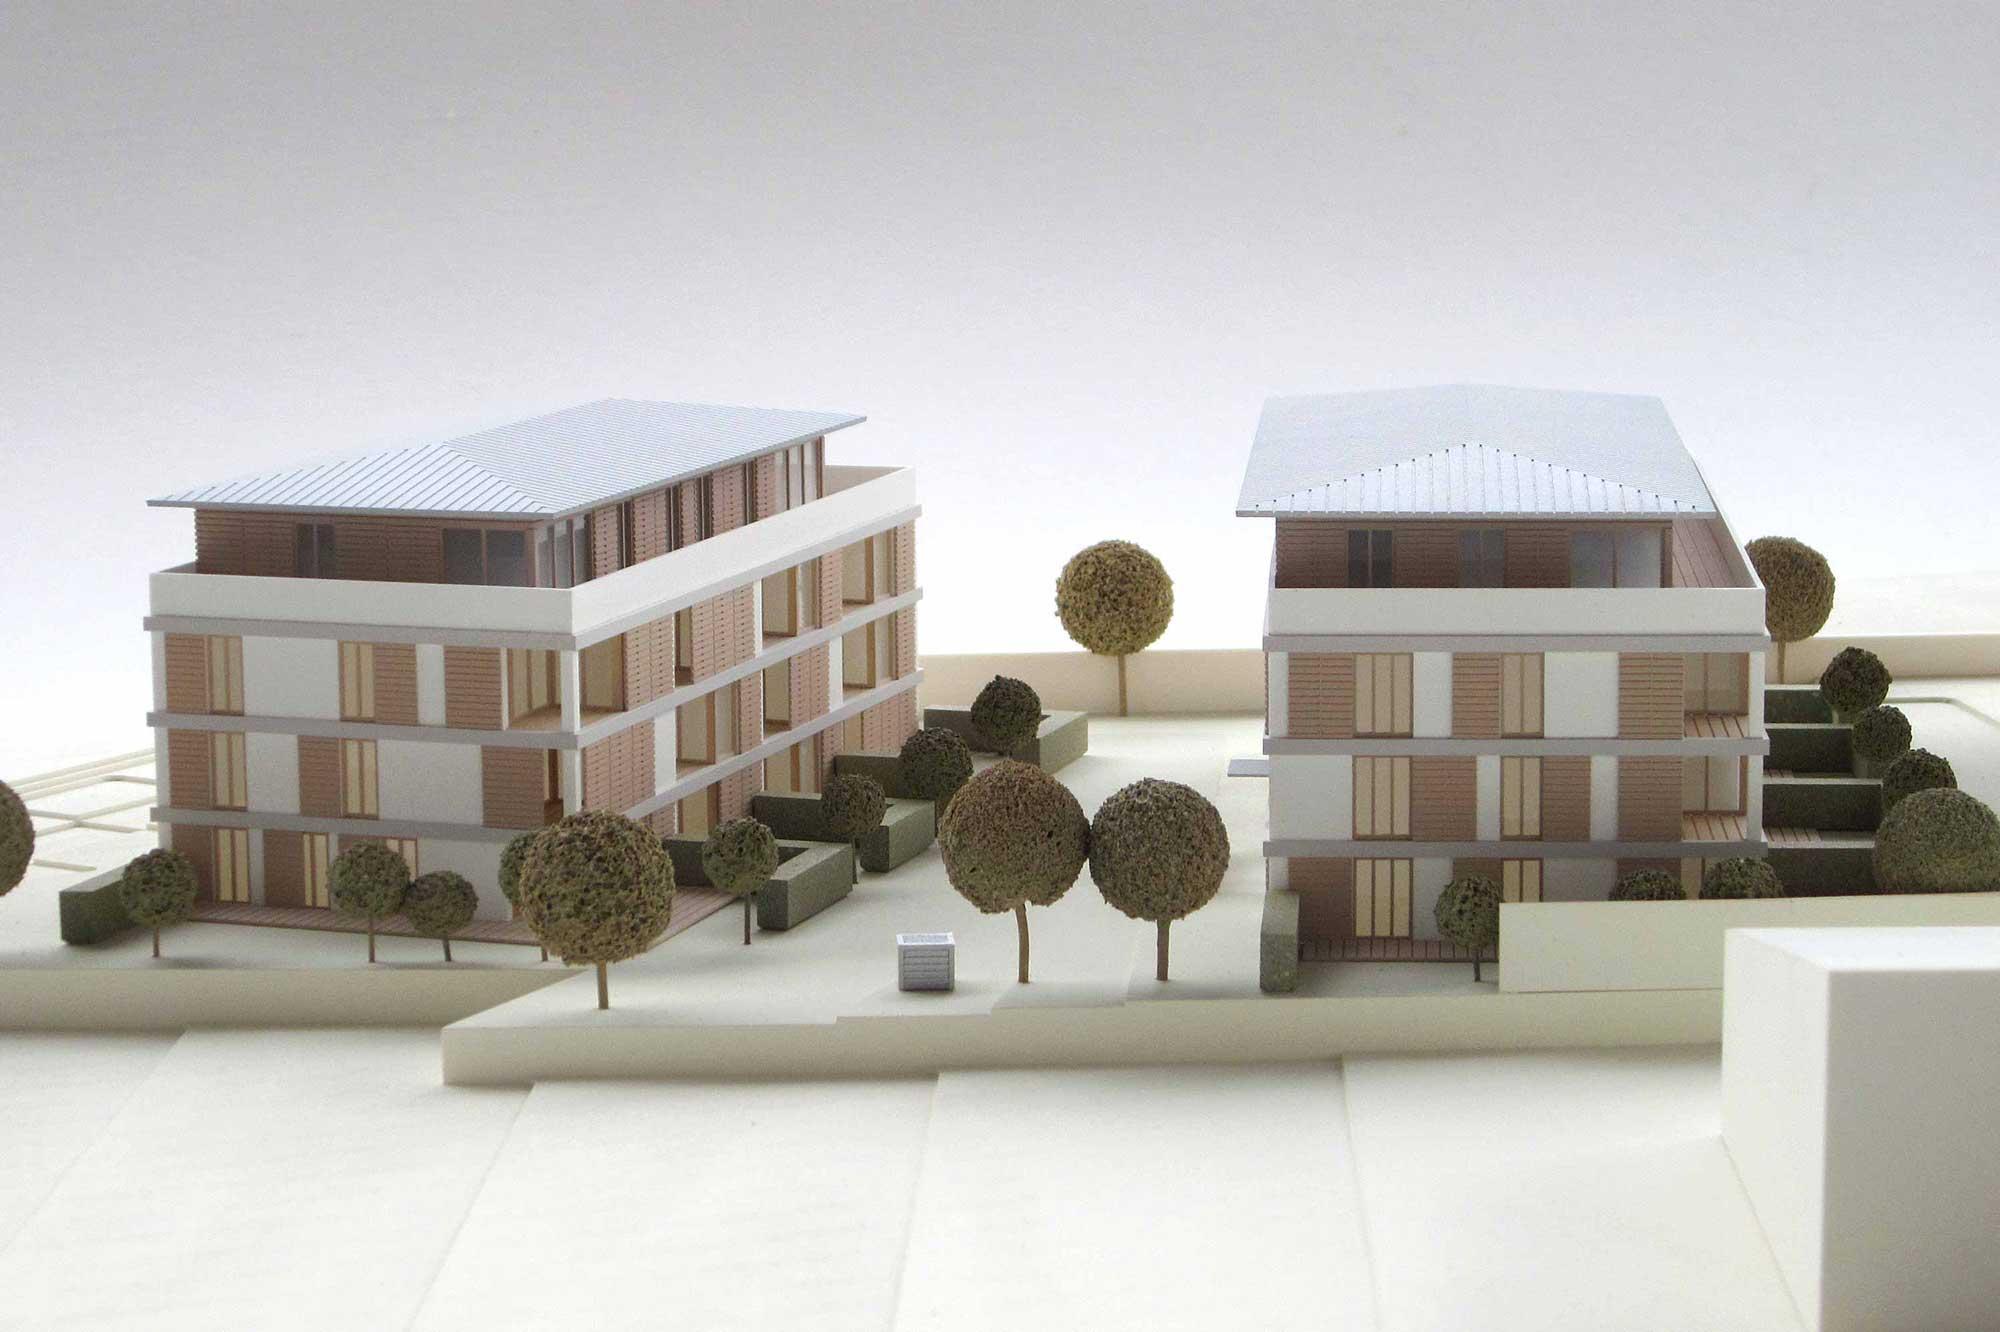 Modellbau Architektur - Architekturmodell - Präsentationsmodell Immobilienprojekt Holzkirchen, Detail